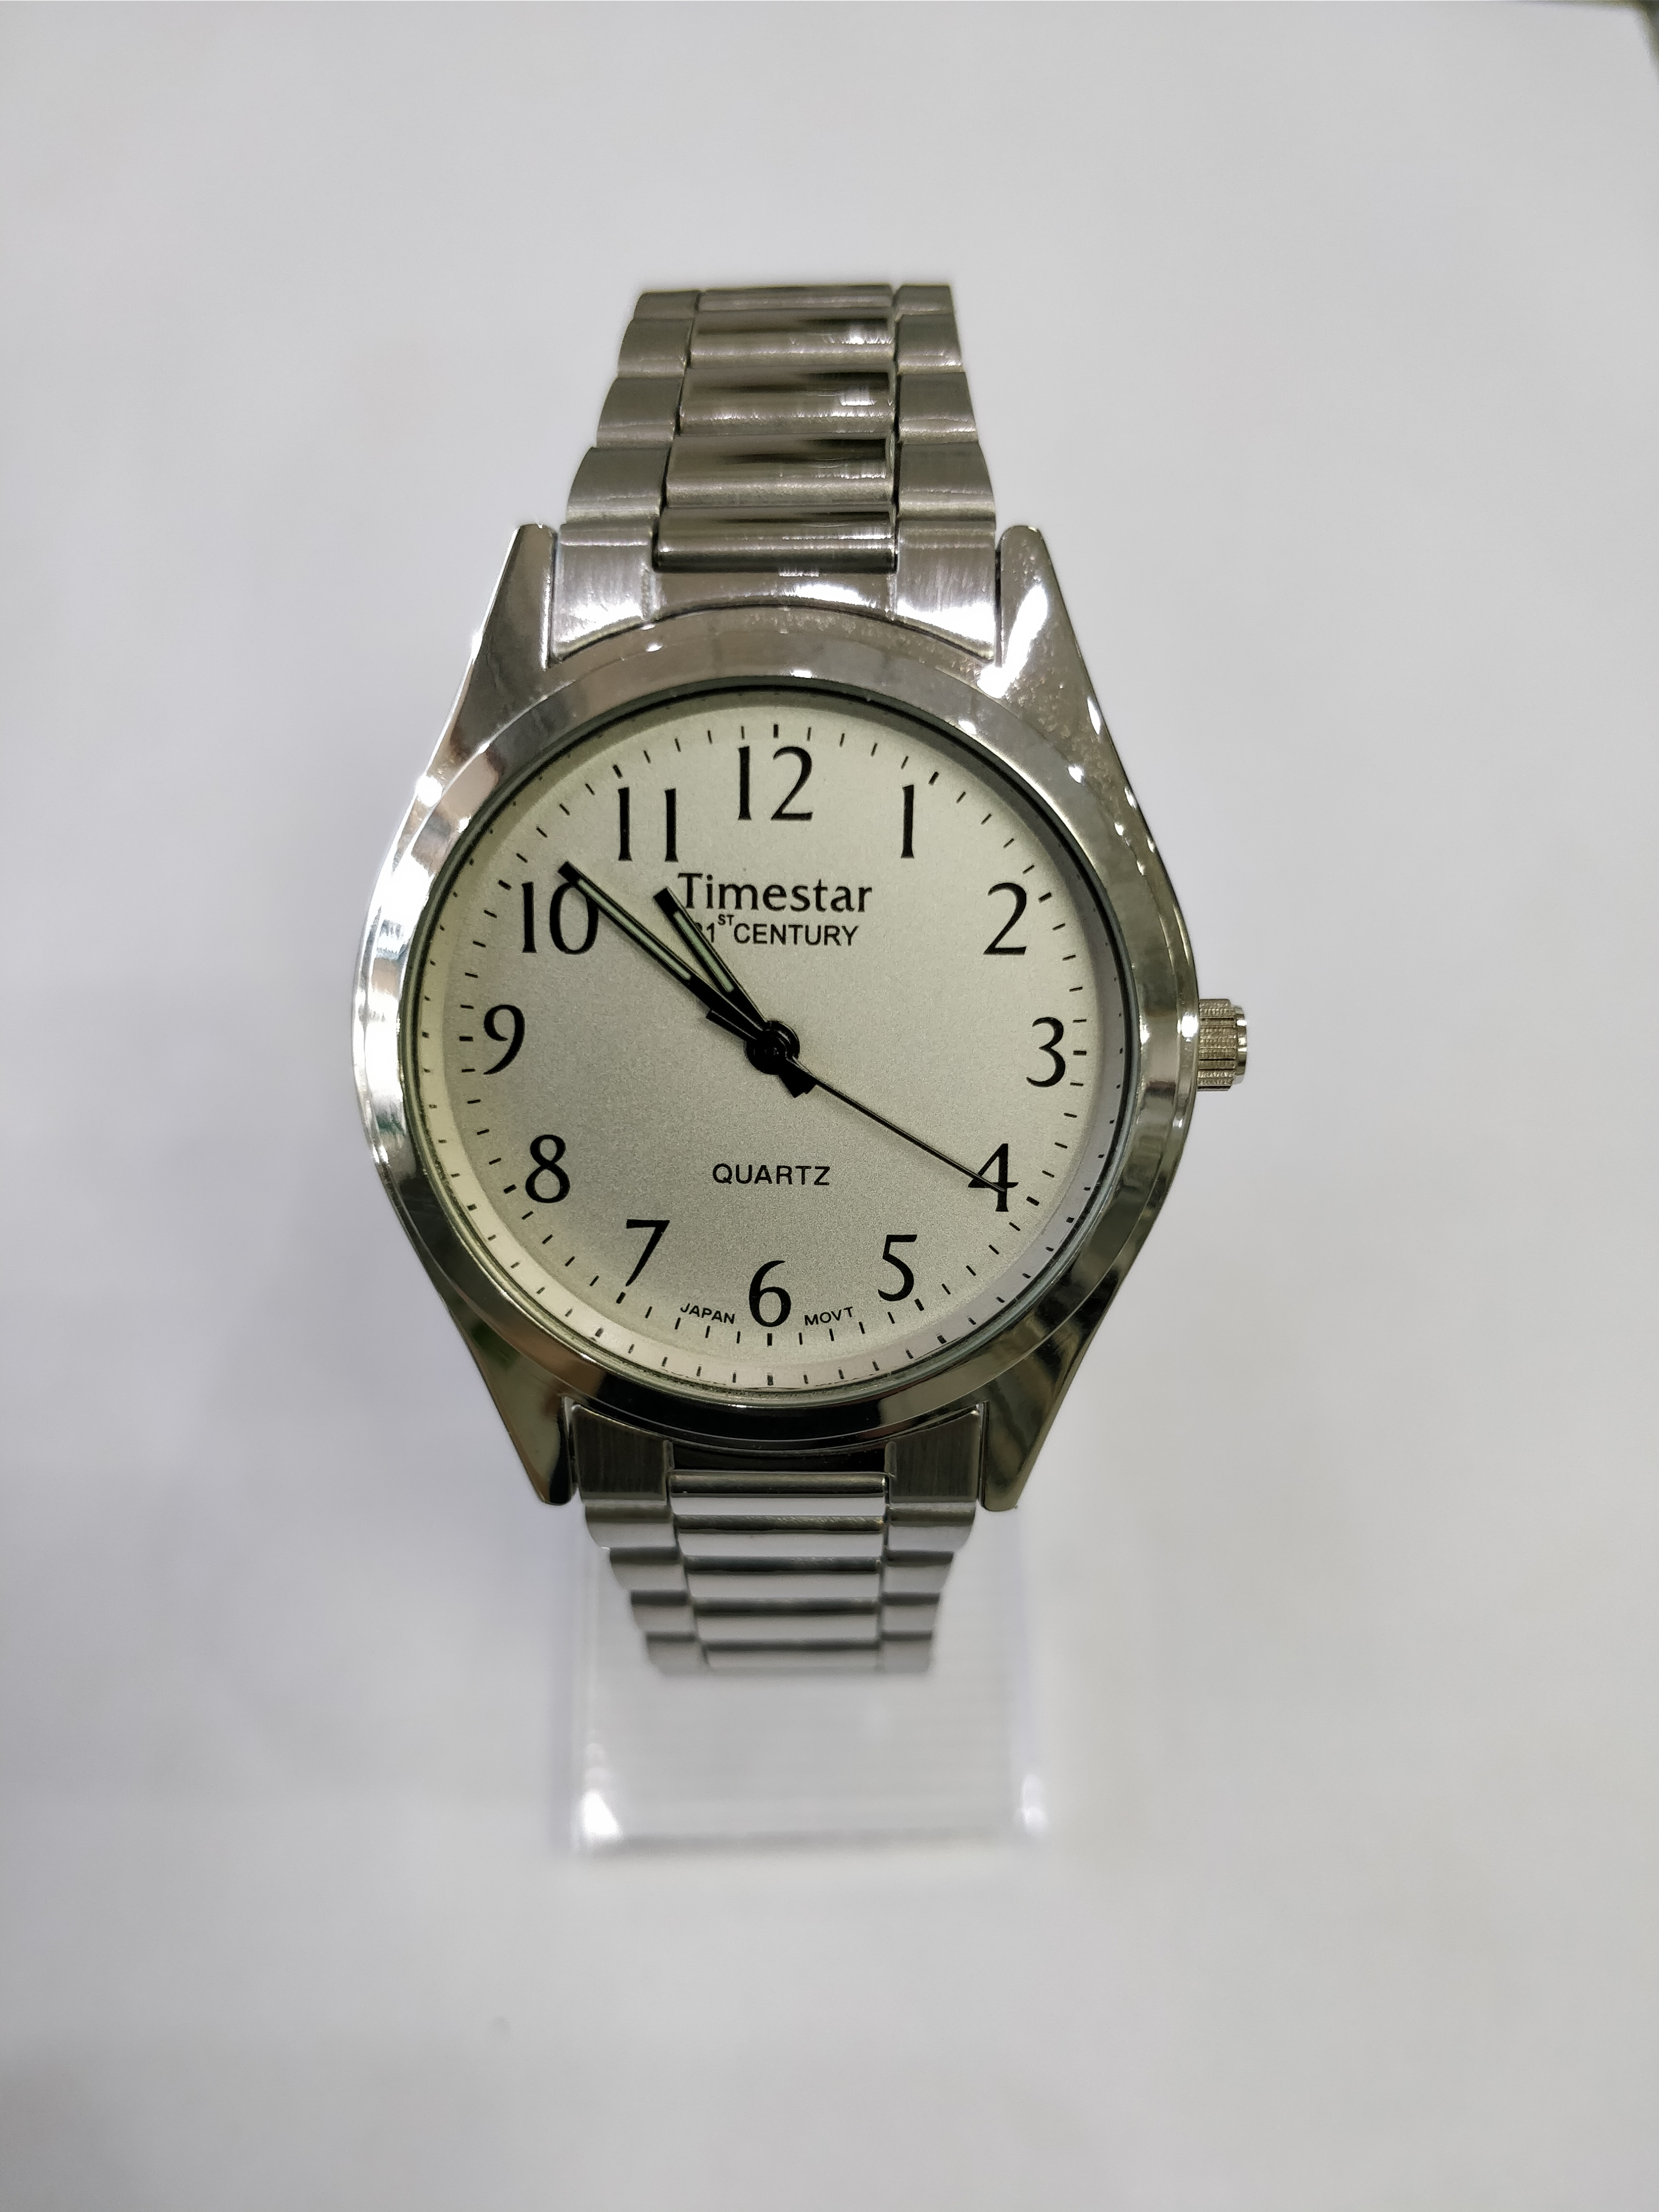 Timestar Ezüst001 Férfi karóra – Karóra Shop cbd9e8574a